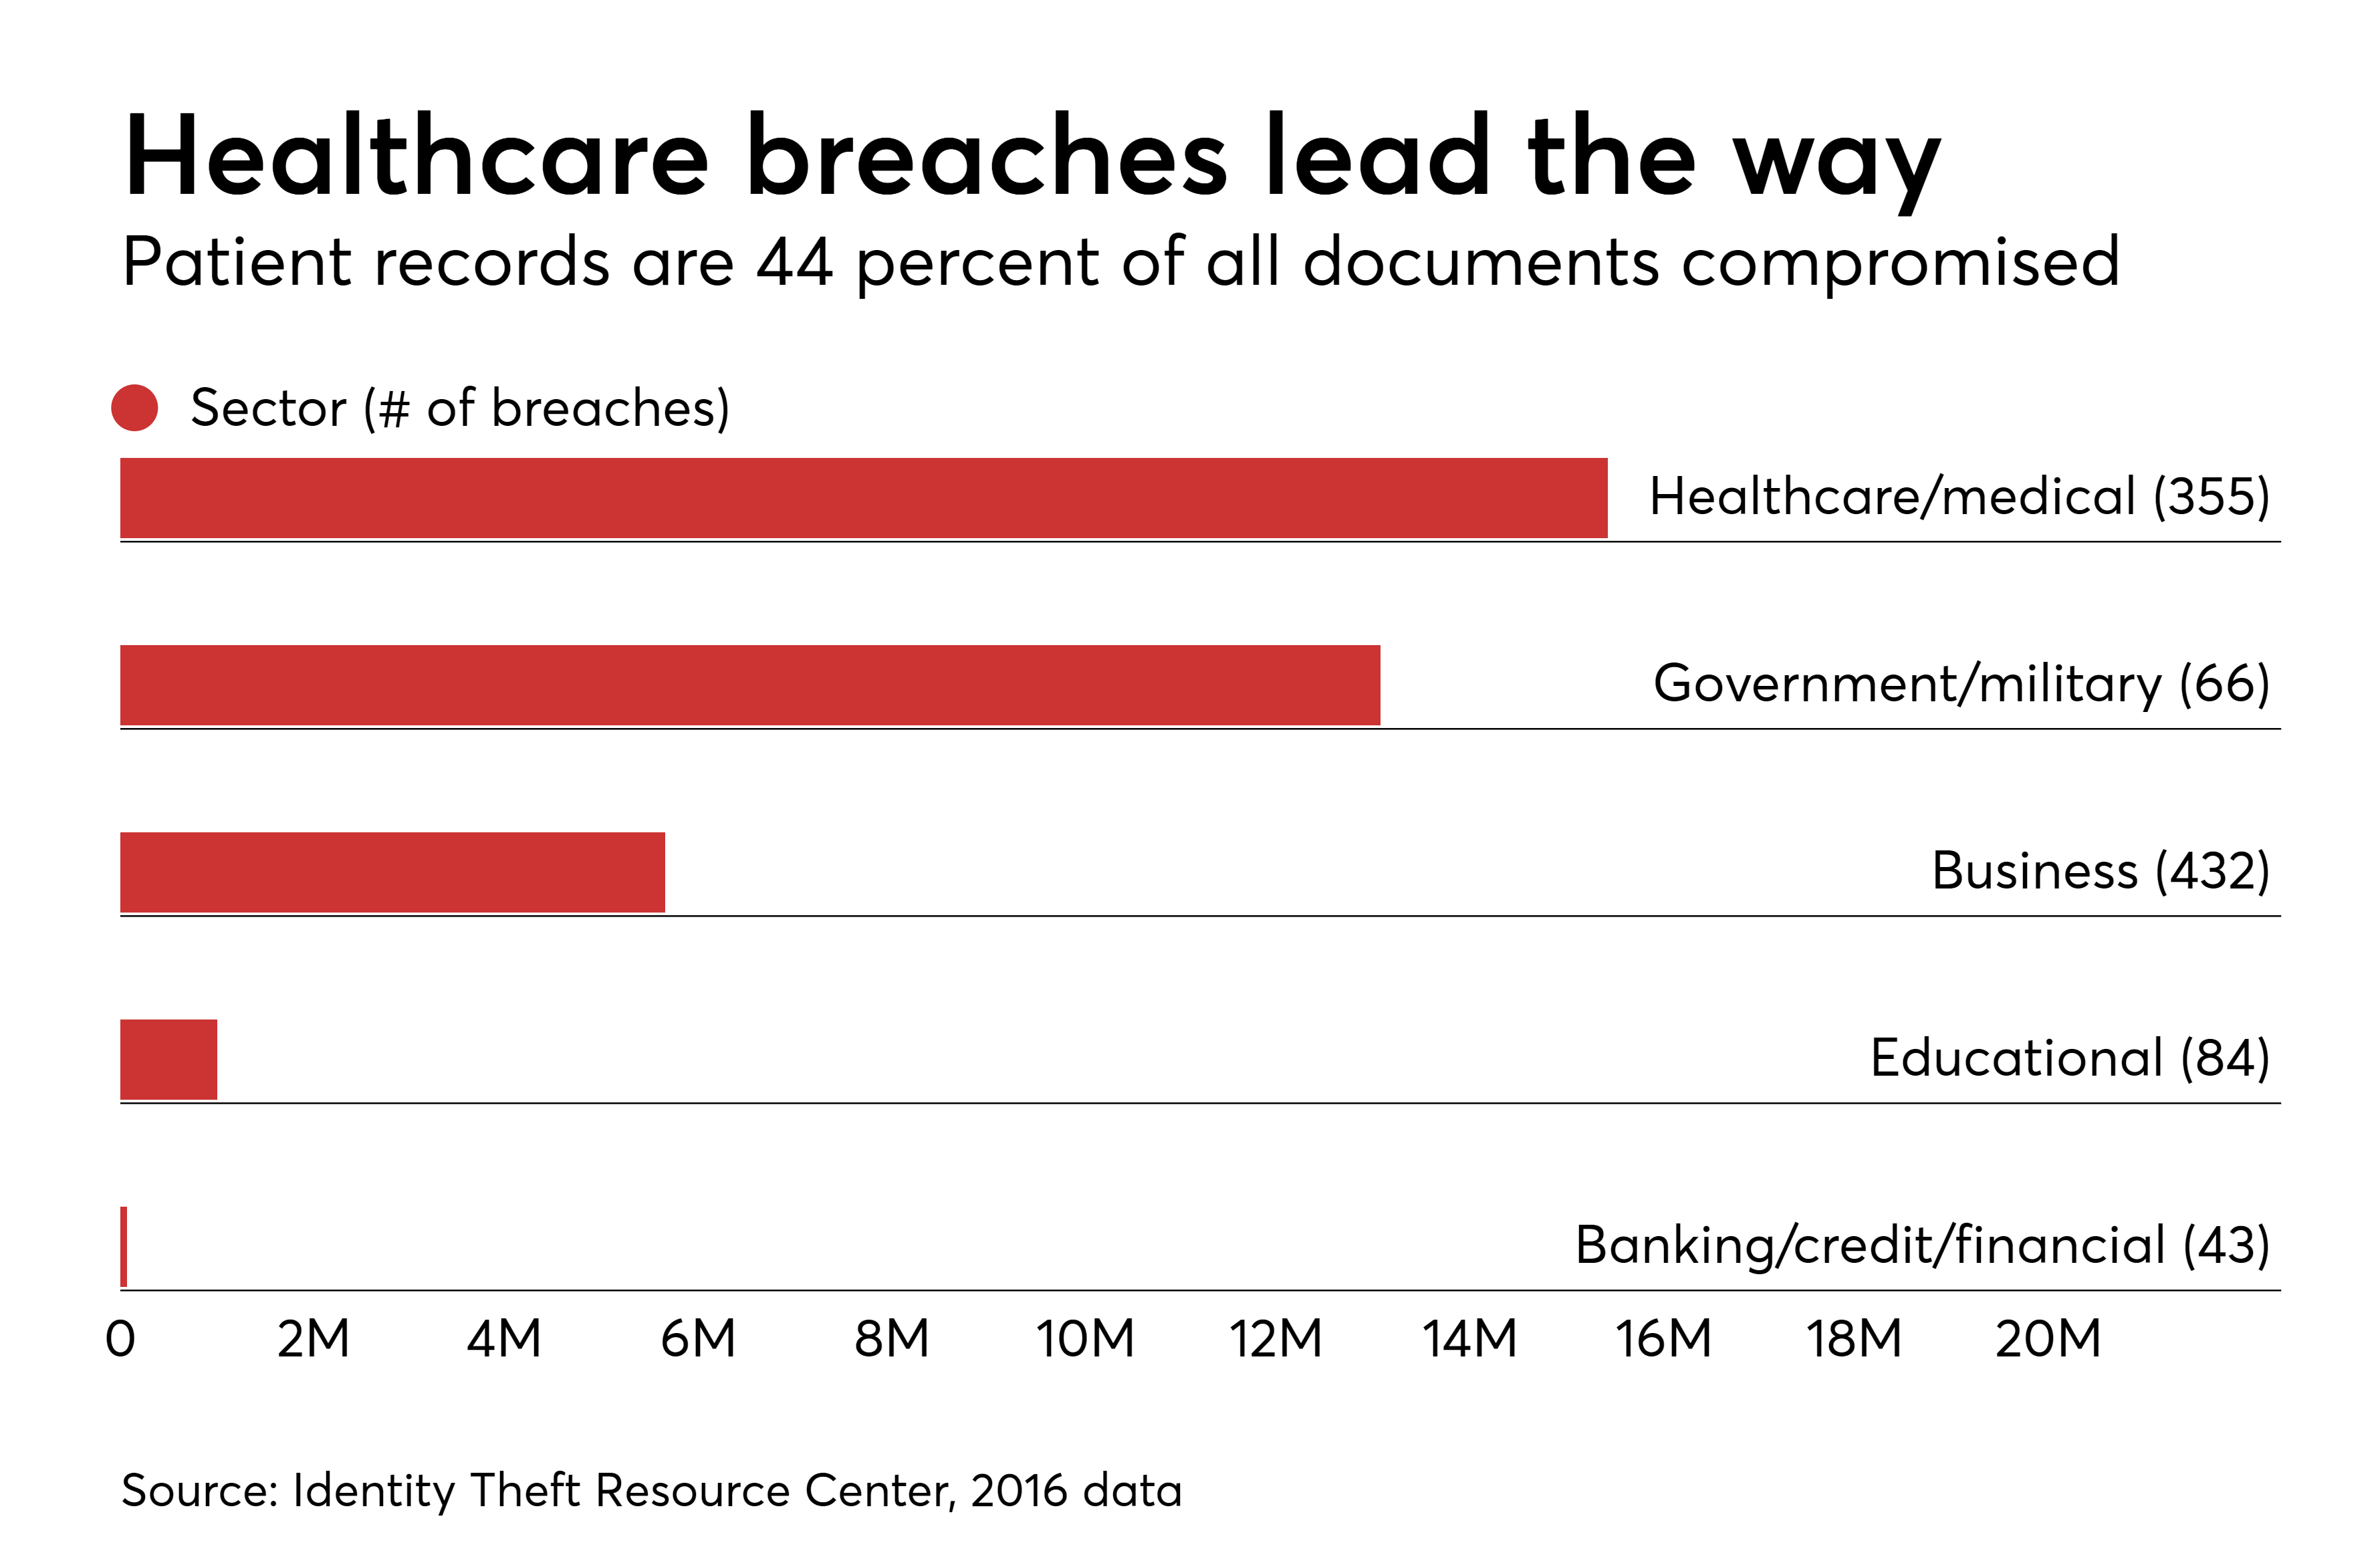 https://assets.sourcemedia.com/66/24/e7ee302b4327b29a3f0137b7c430/hdm-061917-breaches.png